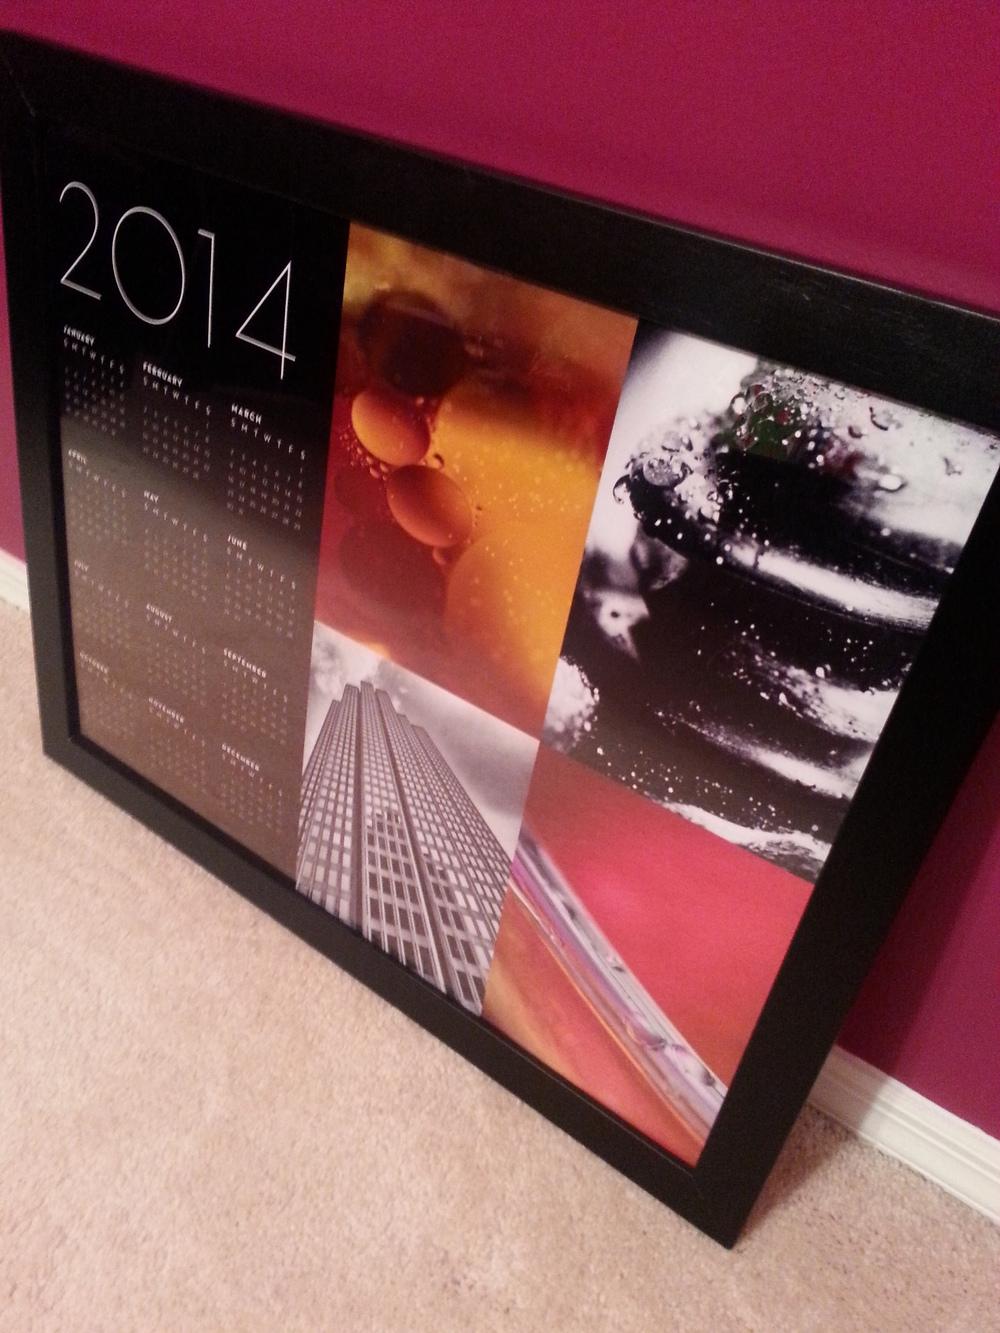 Calendar 2014 Image 2.jpg